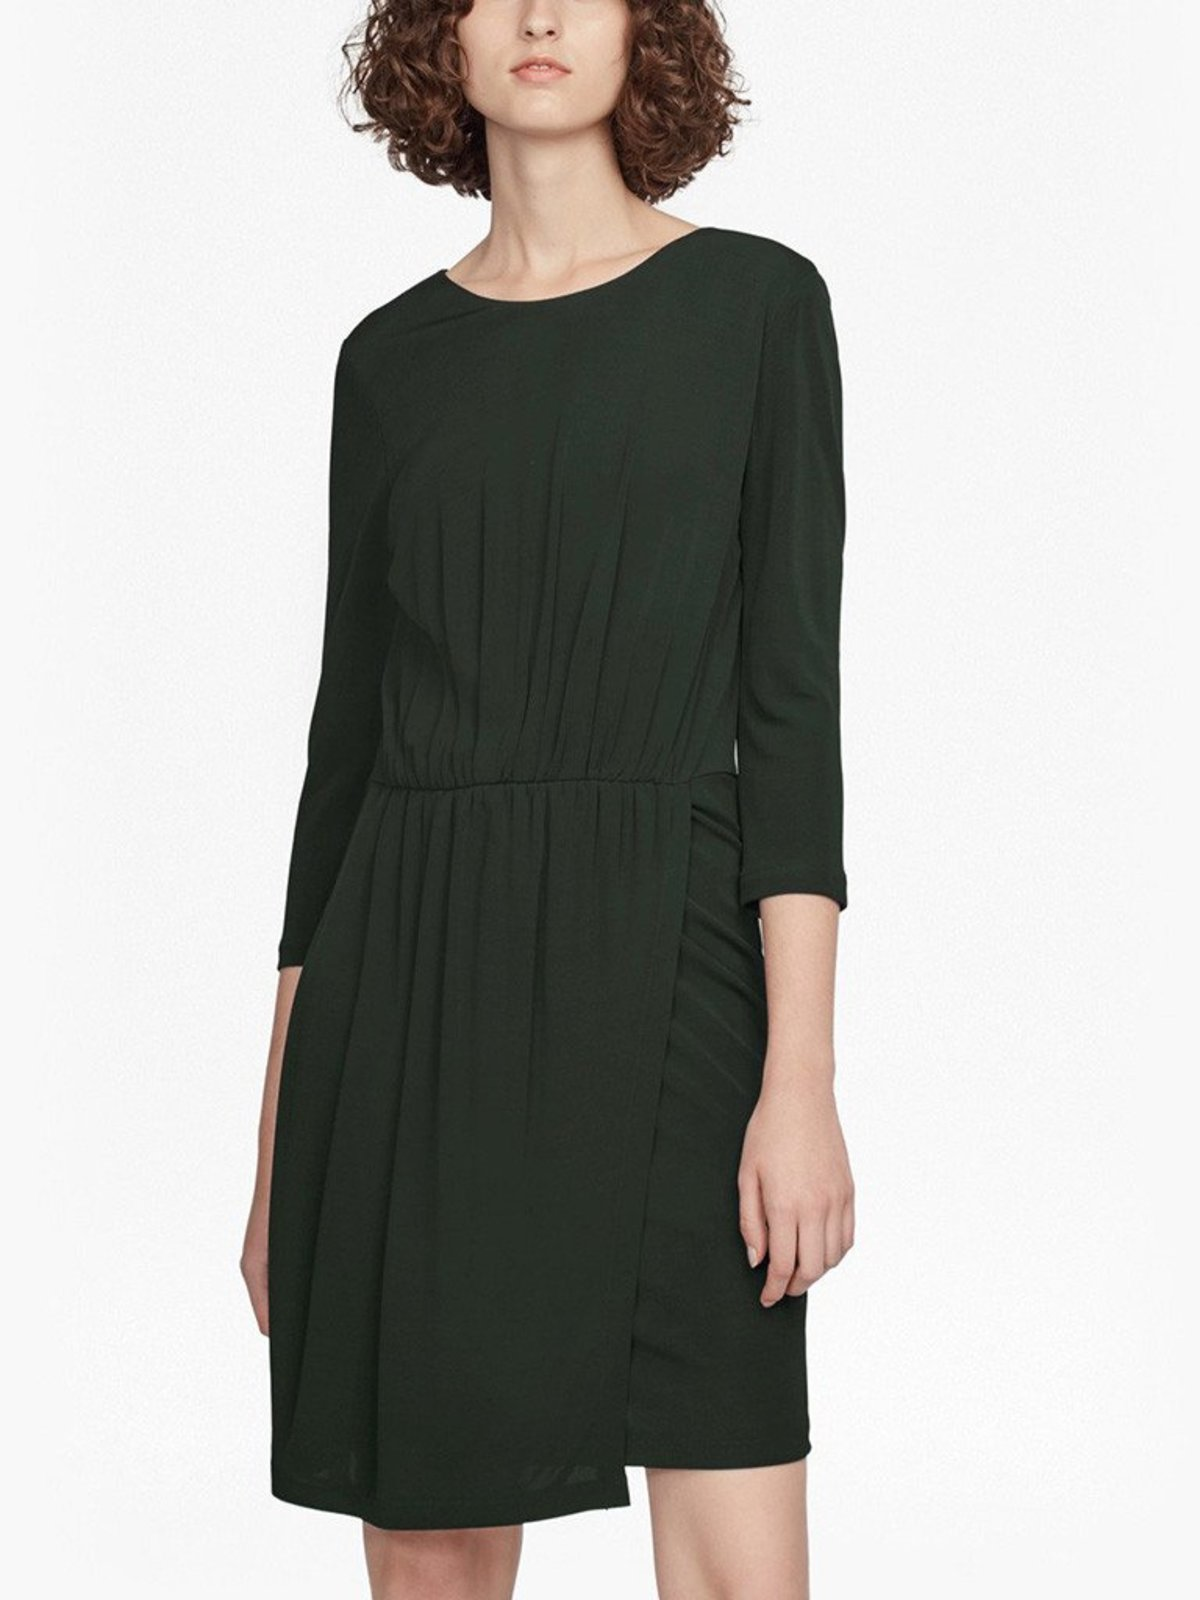 55f6401a400247 French Connection Elsa Dress | Garmentory